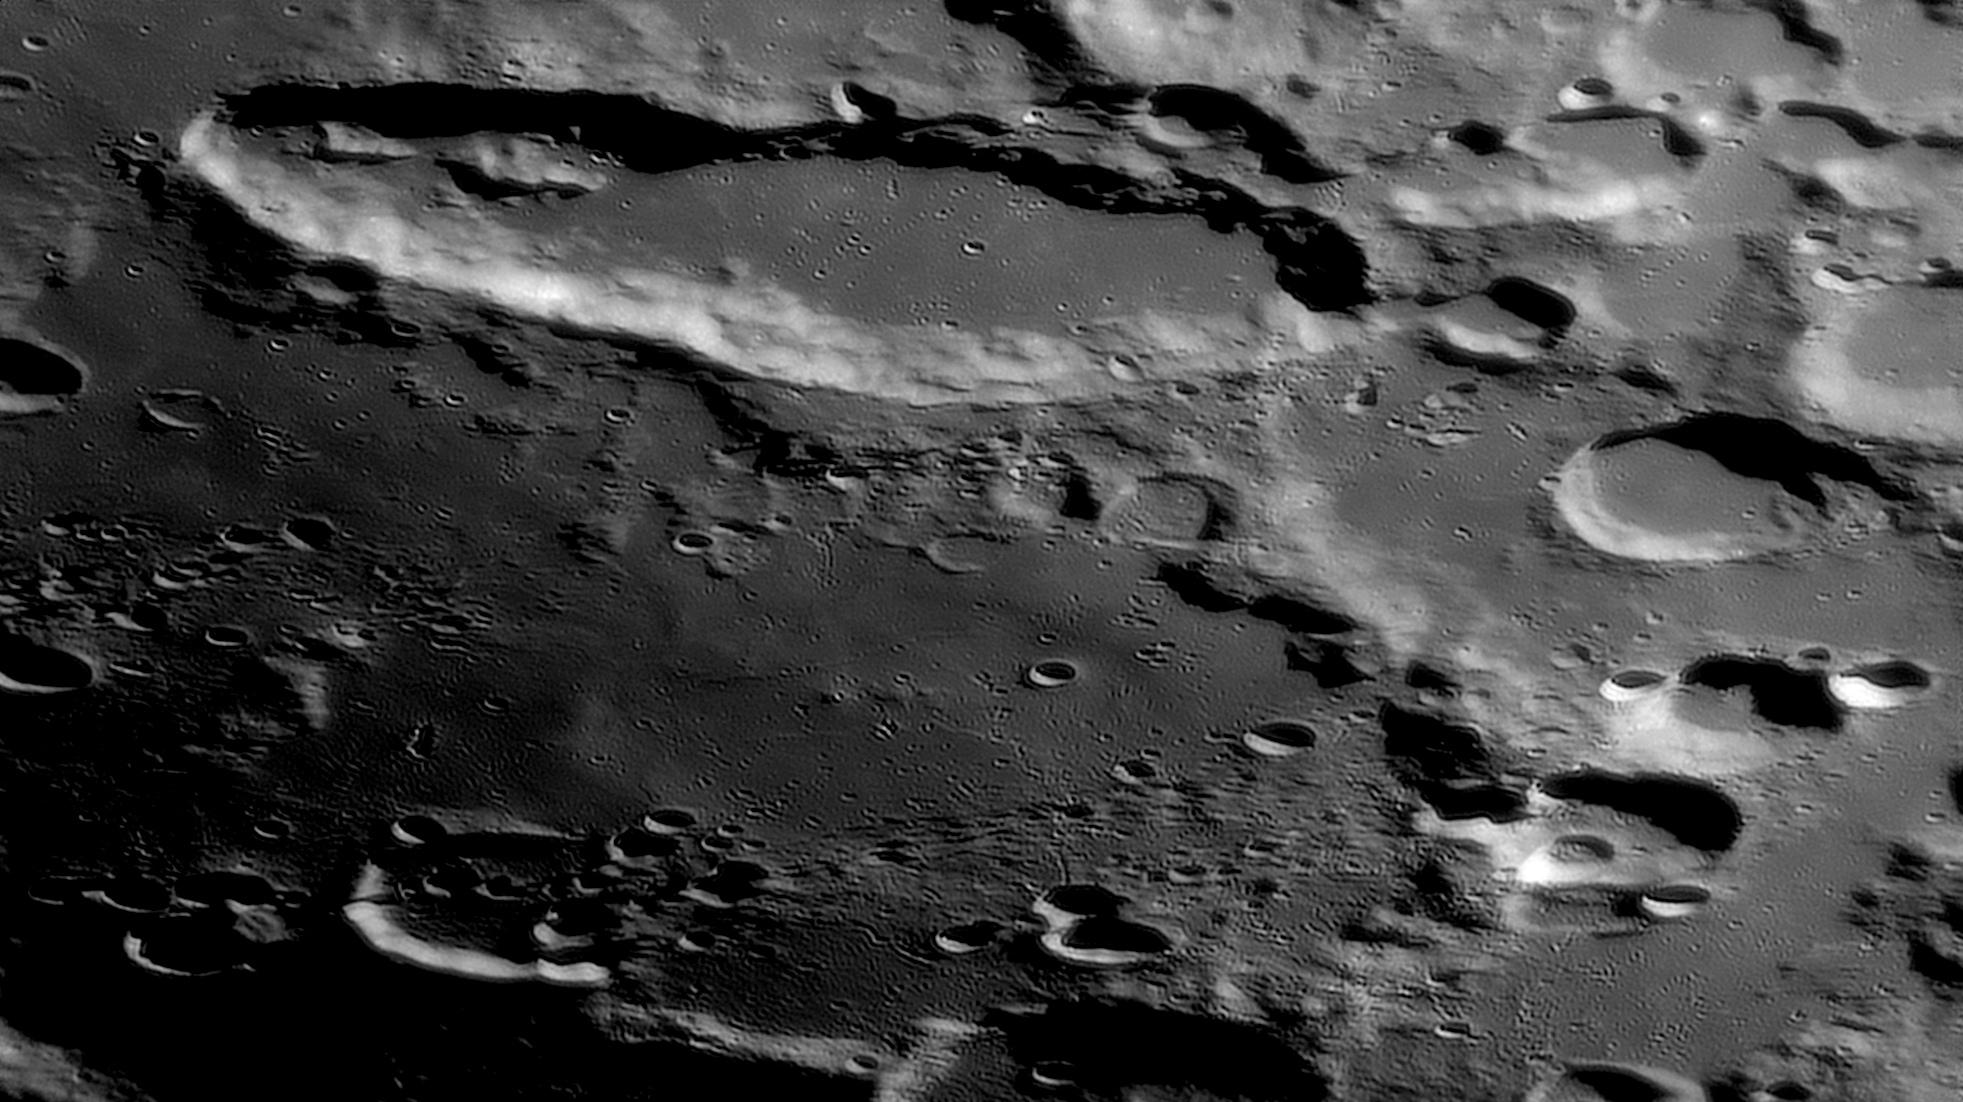 large.2021-02-23-2052_7-R-Moon_l5.jpg.7b9d6ca35828c78be42c10bad0855084.jpg